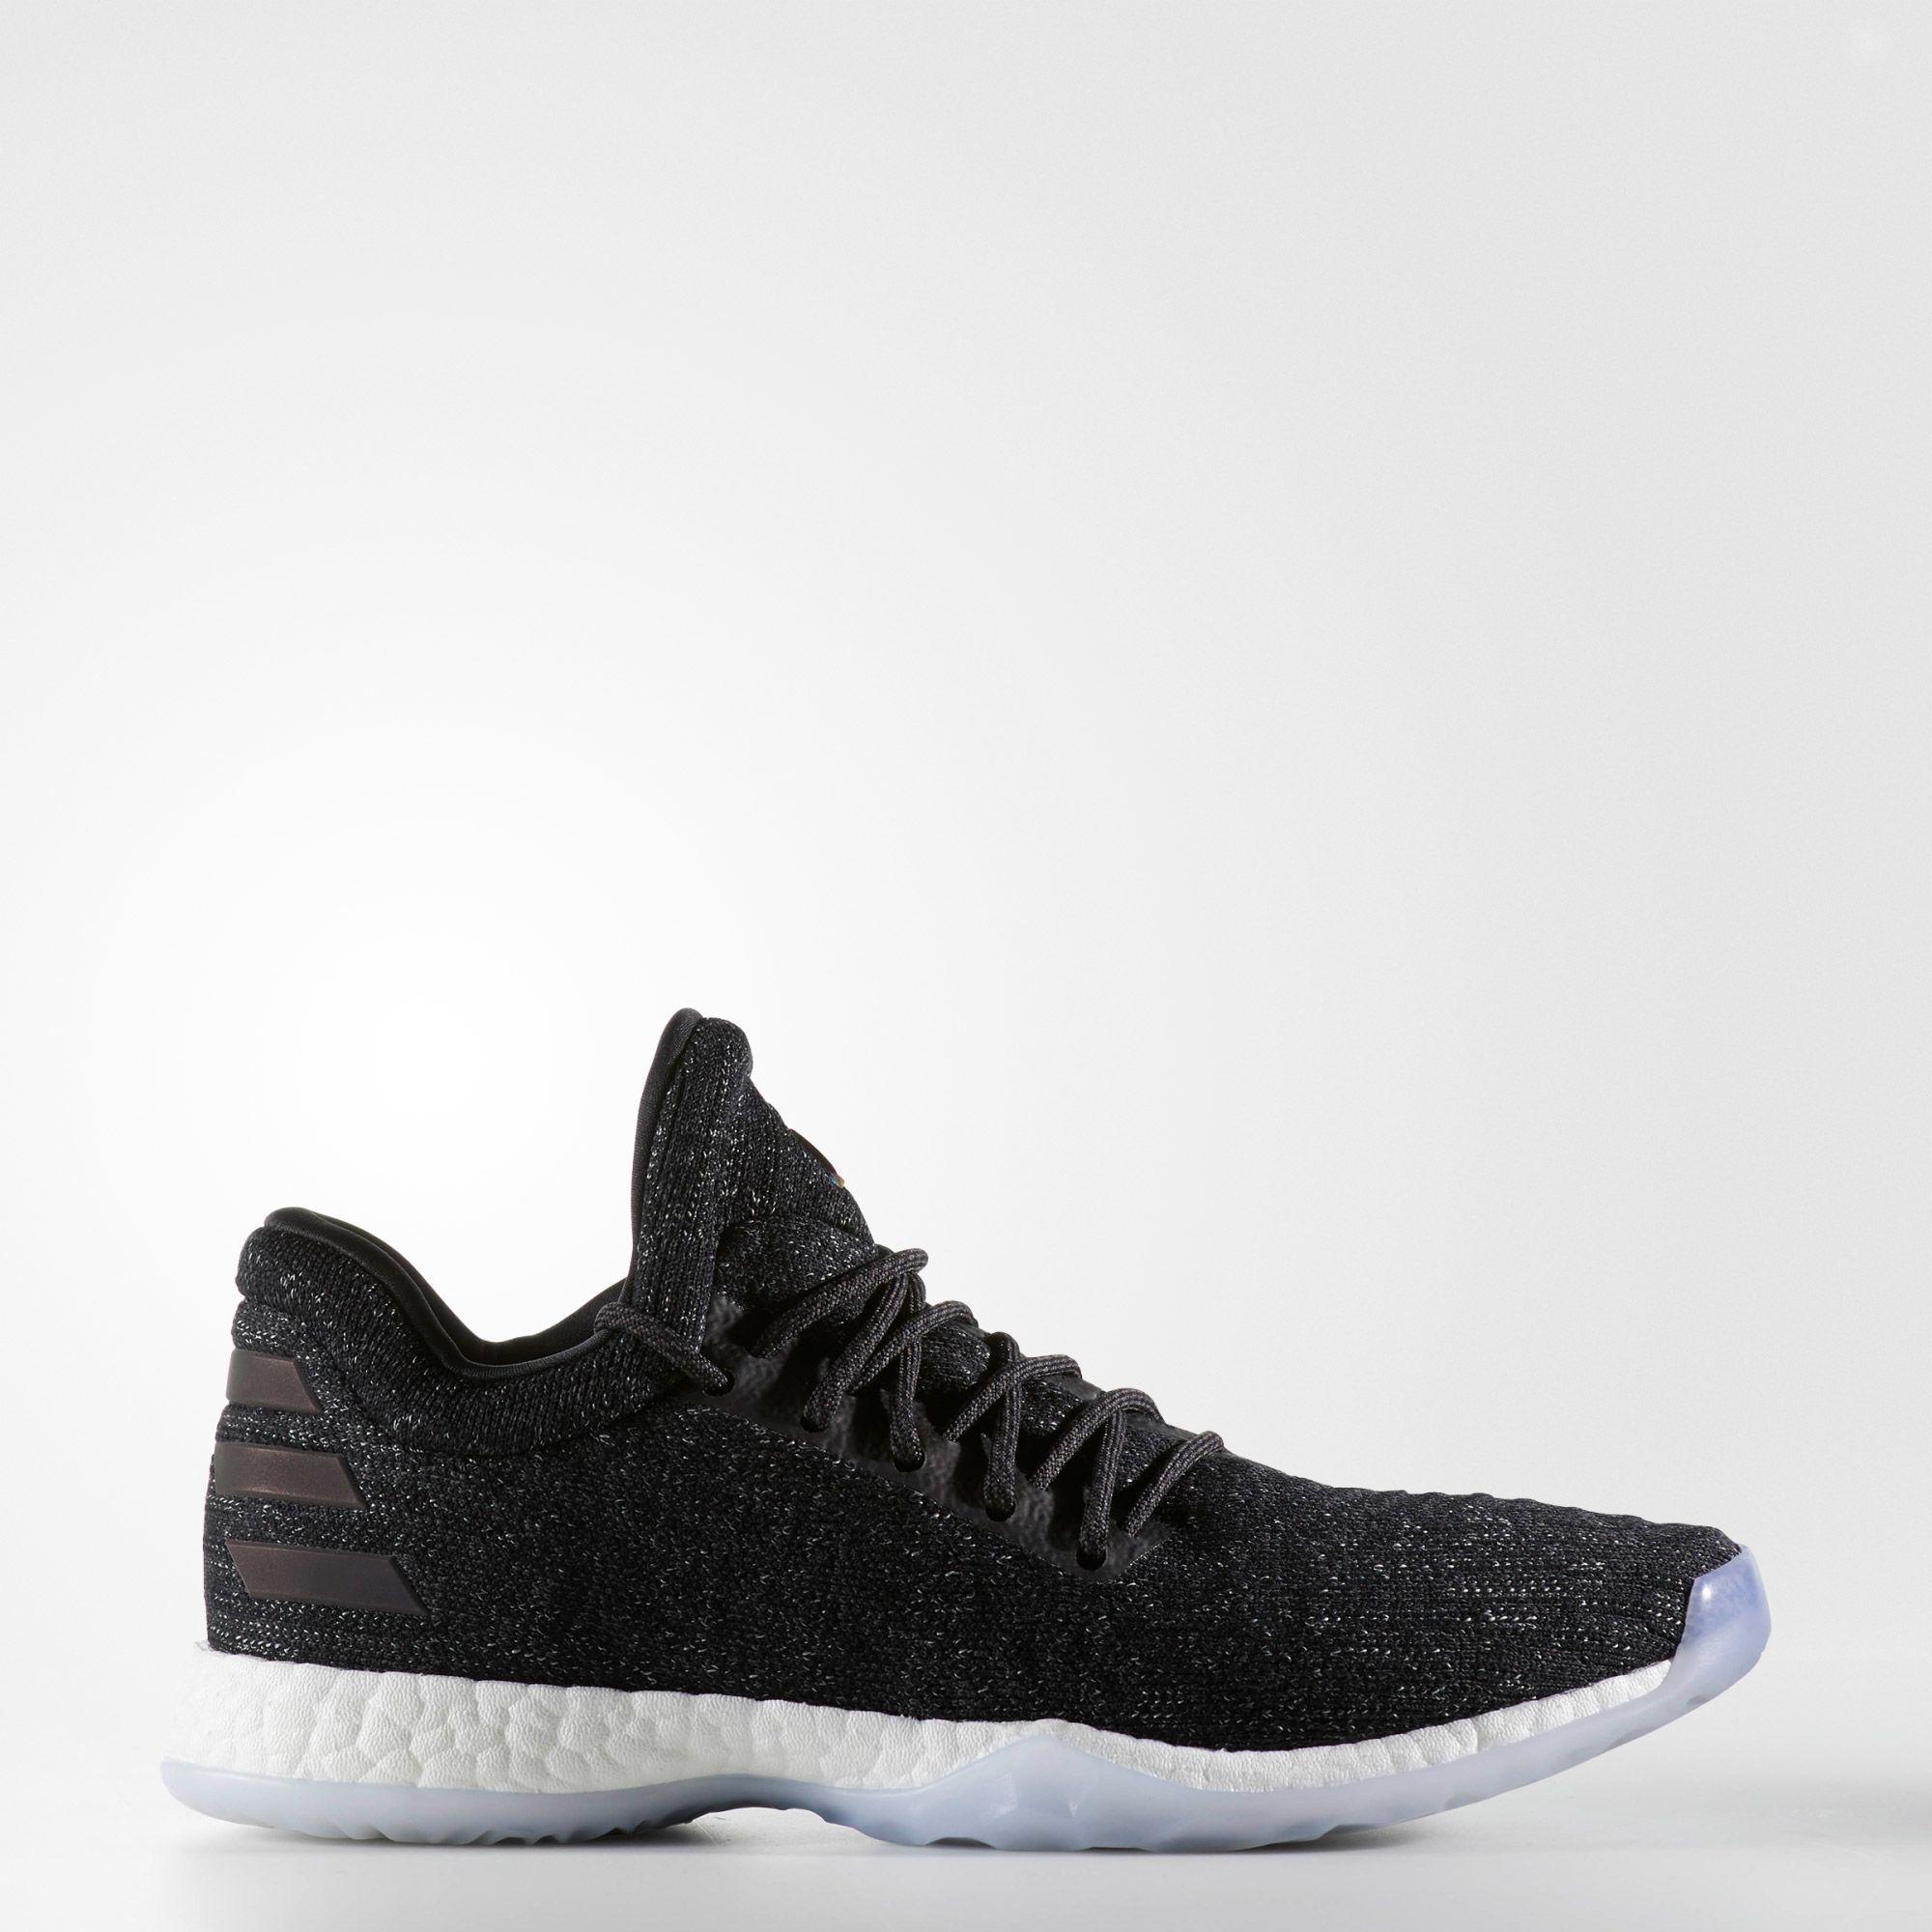 8f1f650a6fb2 adidas - Harden LS Primeknit Shoes